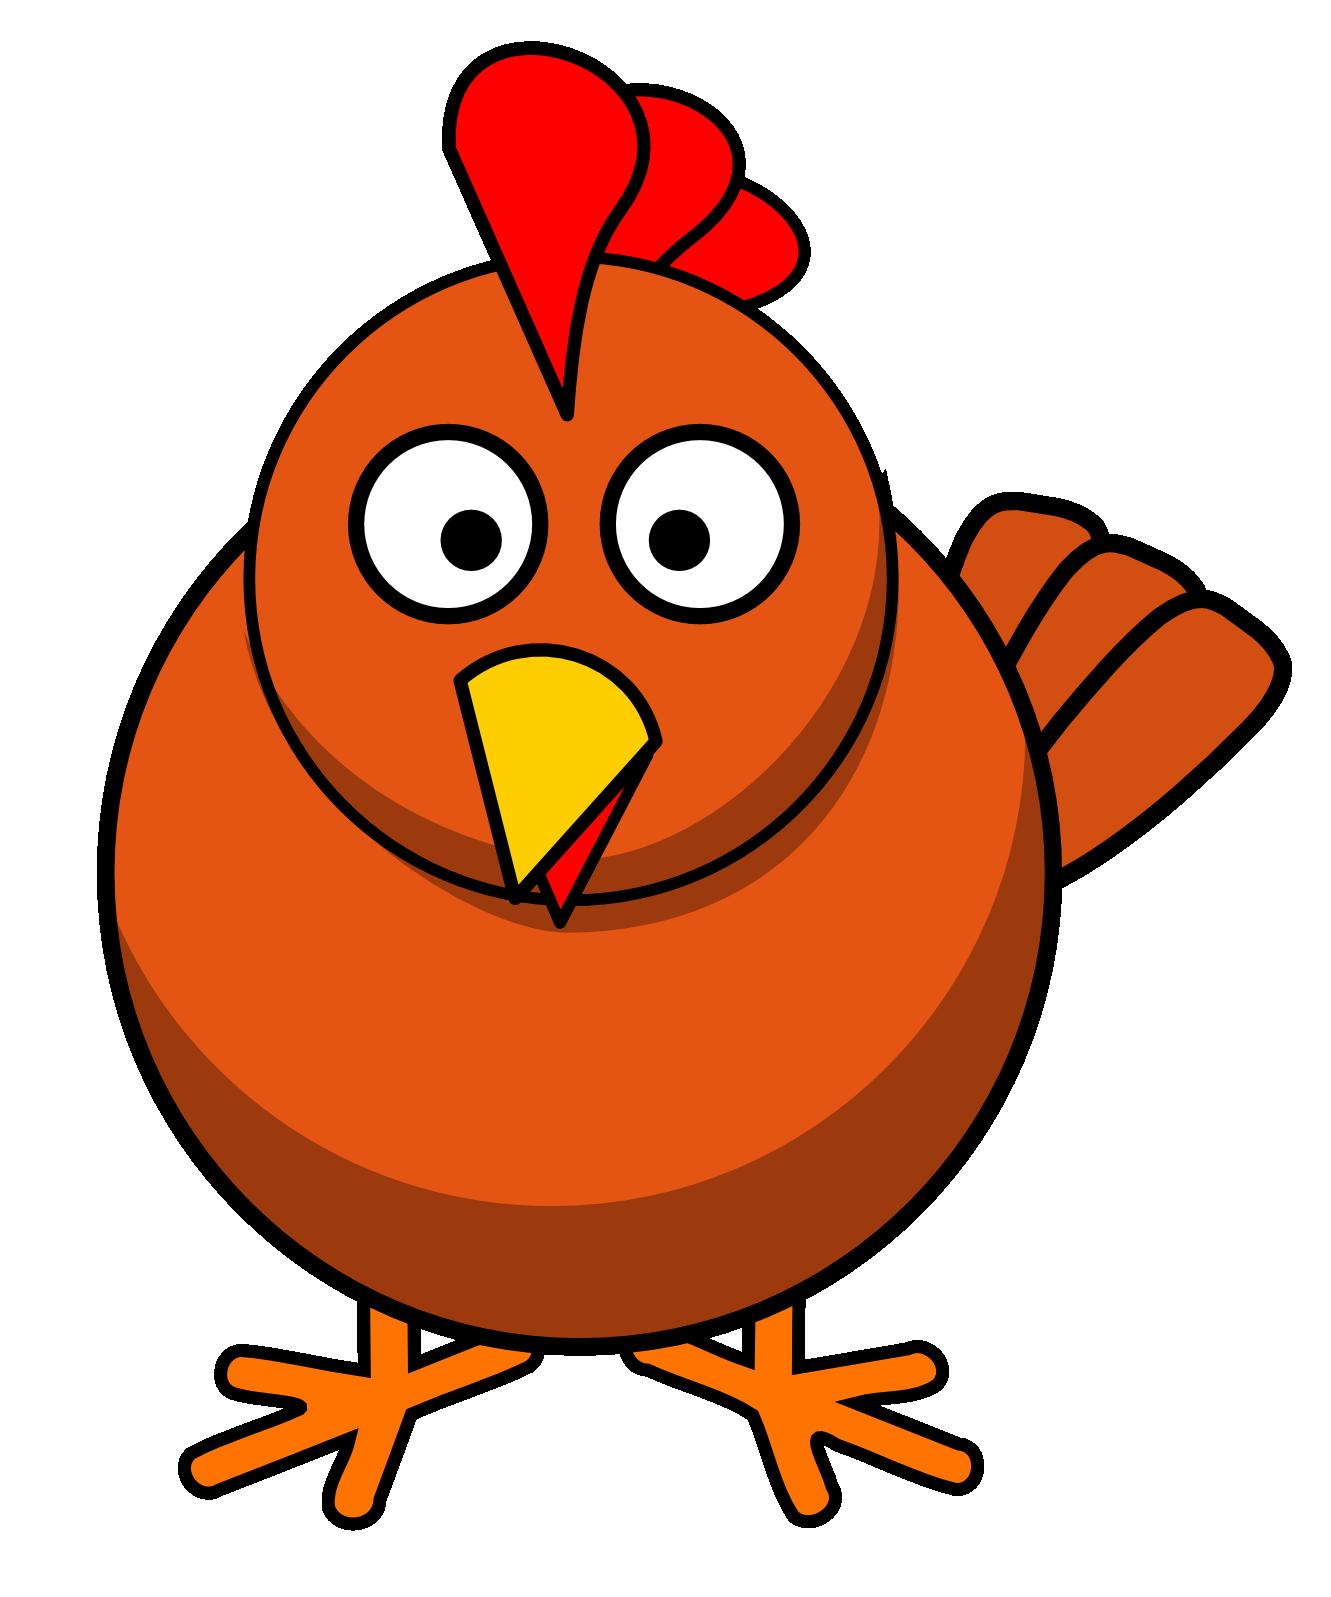 Free Chicken Food Clipart - Info